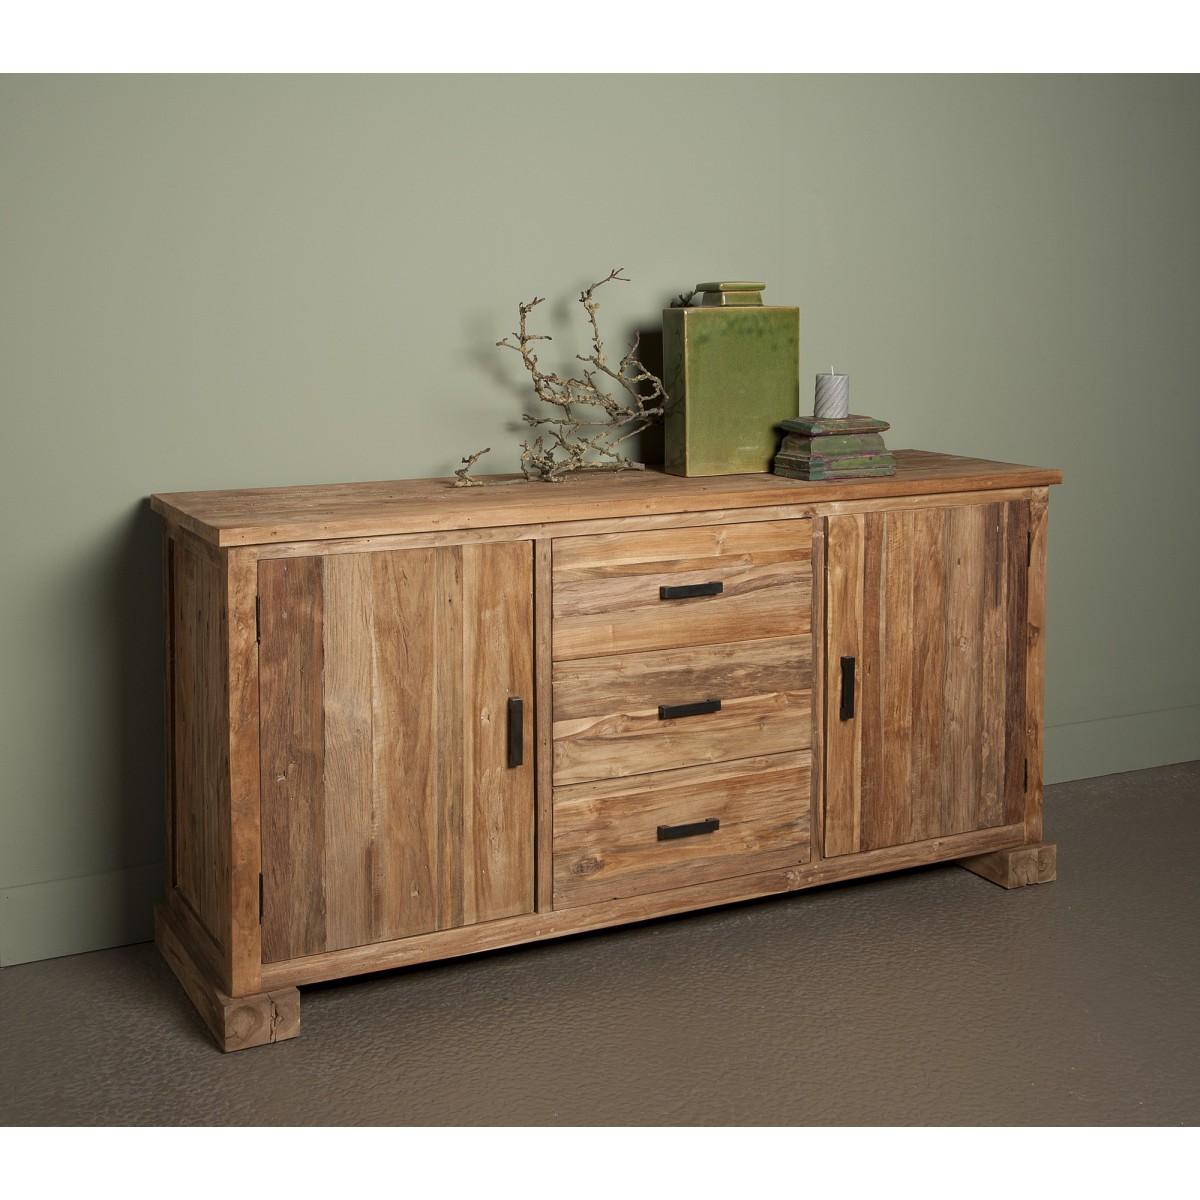 lorenzo-dressoir-220-cm-oud-teak-2-deur-6-laden-ss0851